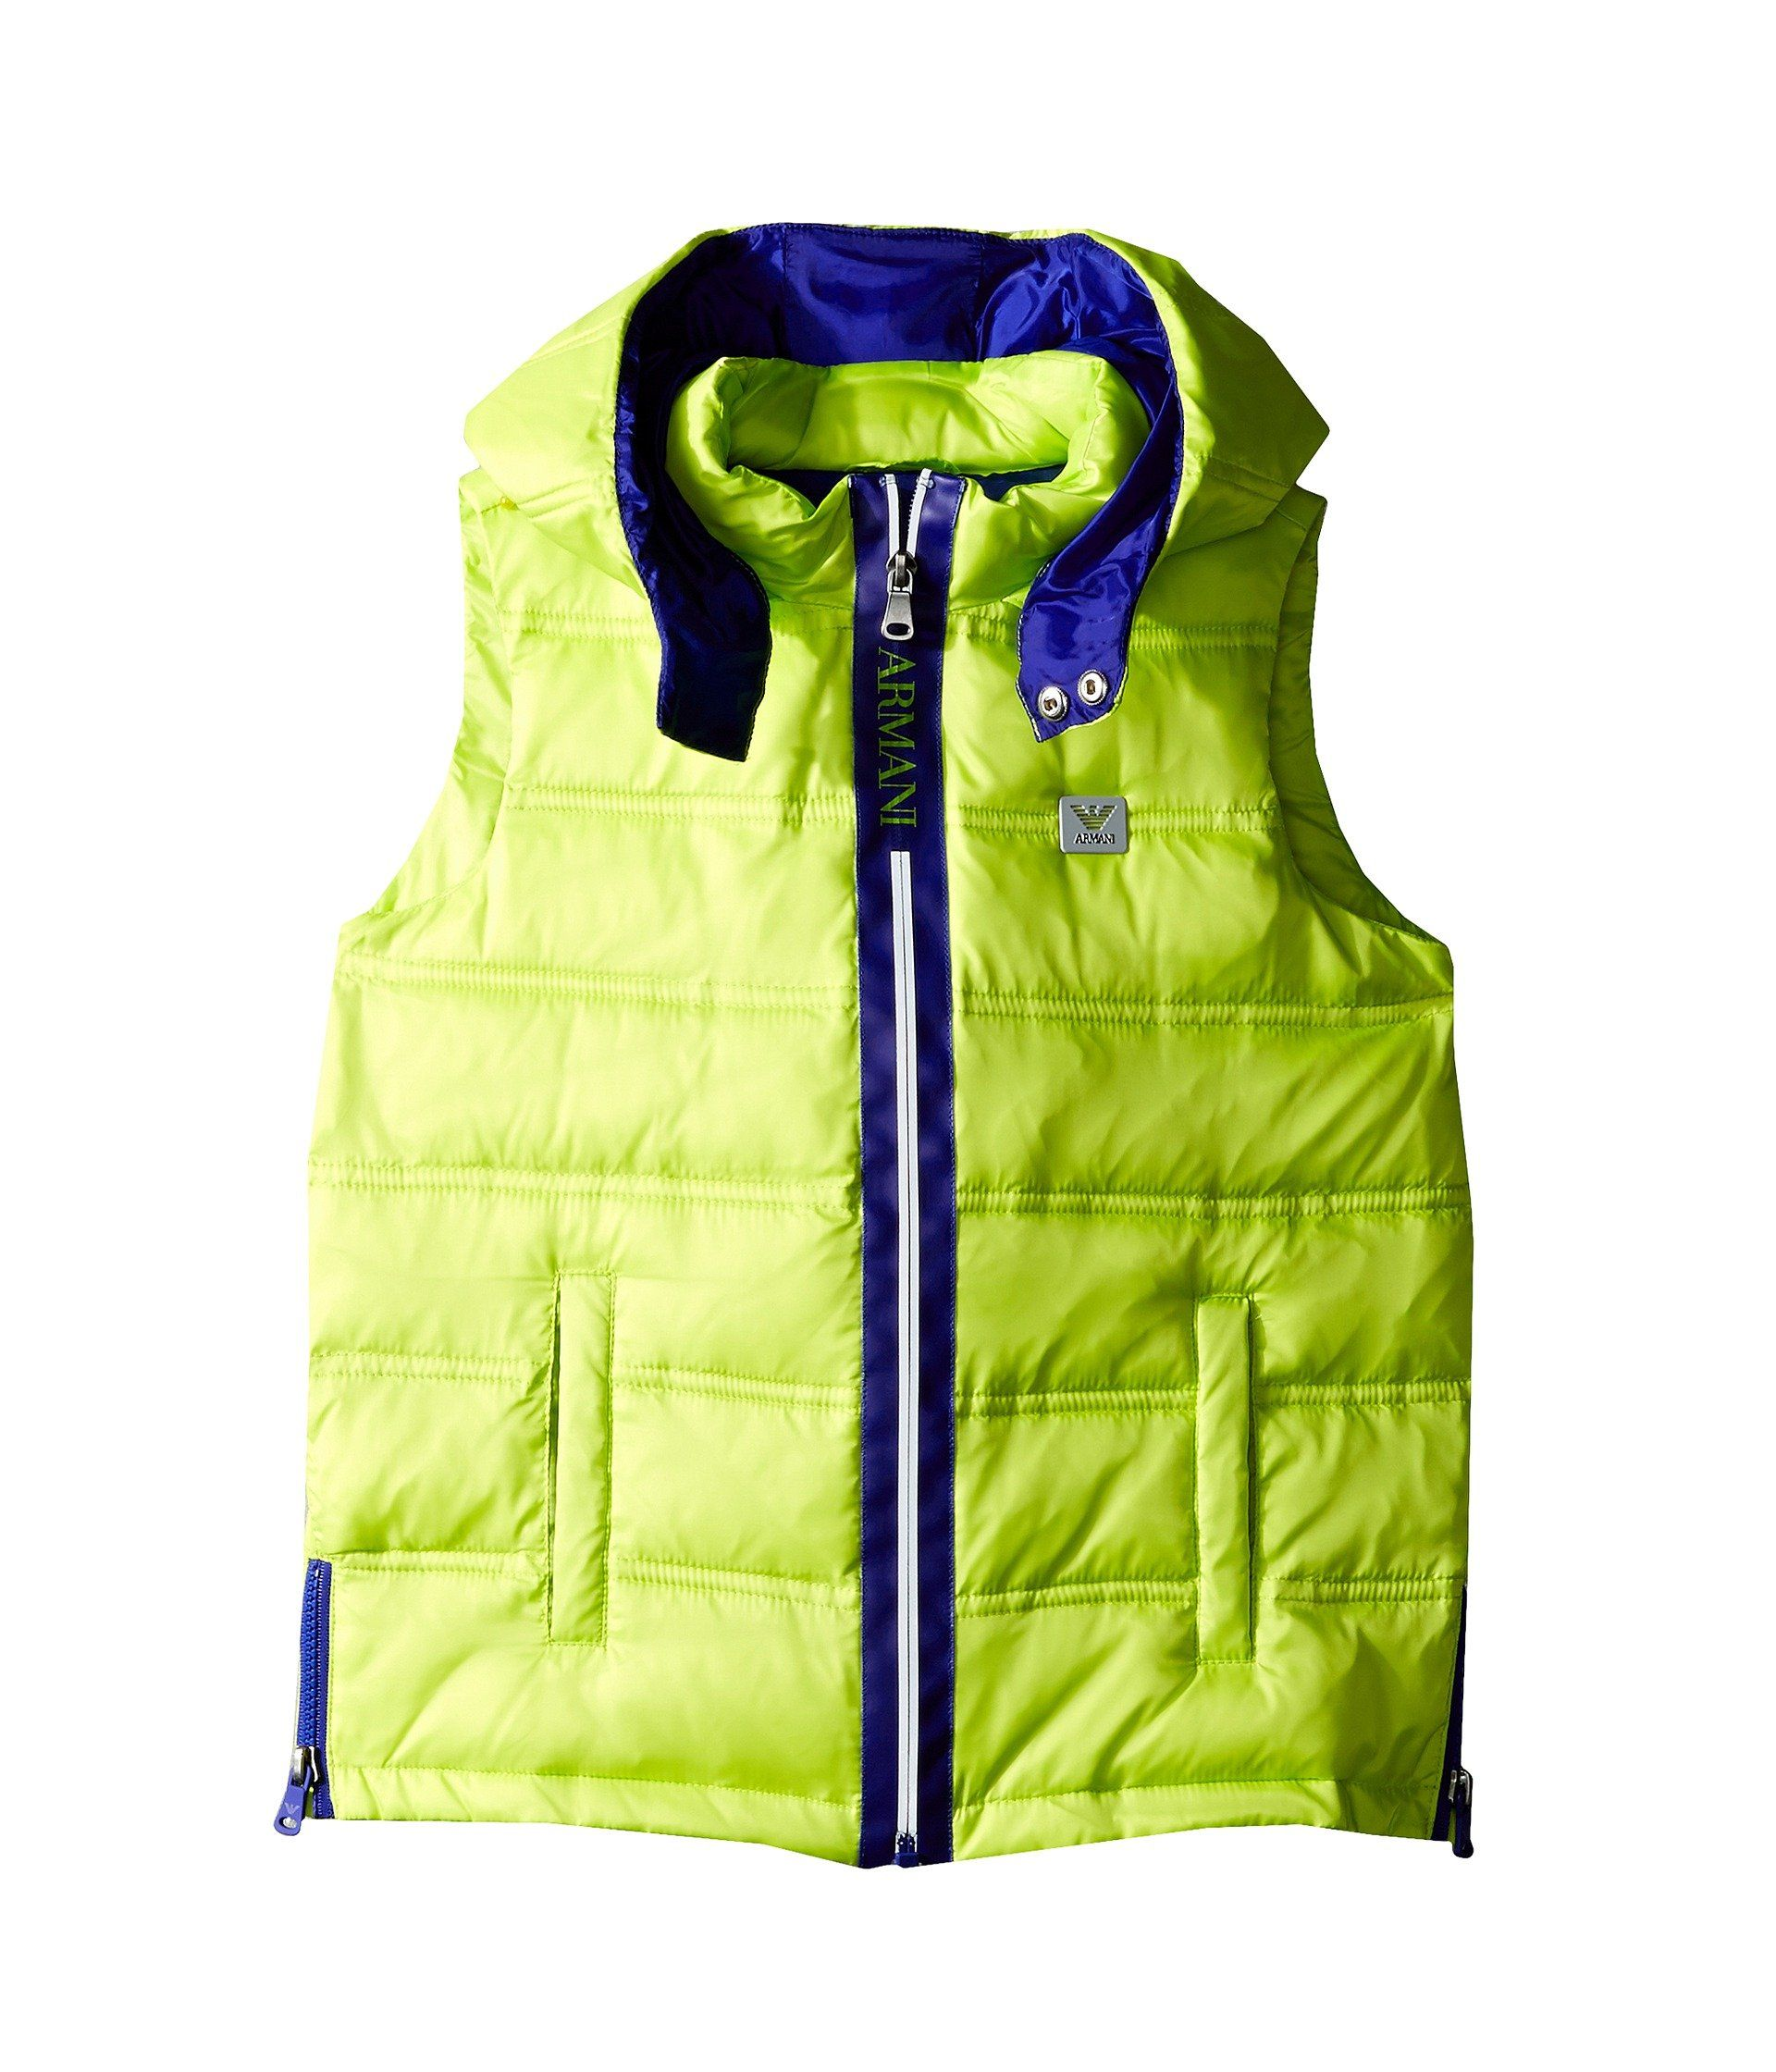 Armani Junior Boy S Puffer Vest With Blue Trim Toddler Little Kids Big Kids Lime Outerwear 6 Little Kids Made In Us Armani Junior Boy Armani Junior Big Kids [ 2240 x 1920 Pixel ]